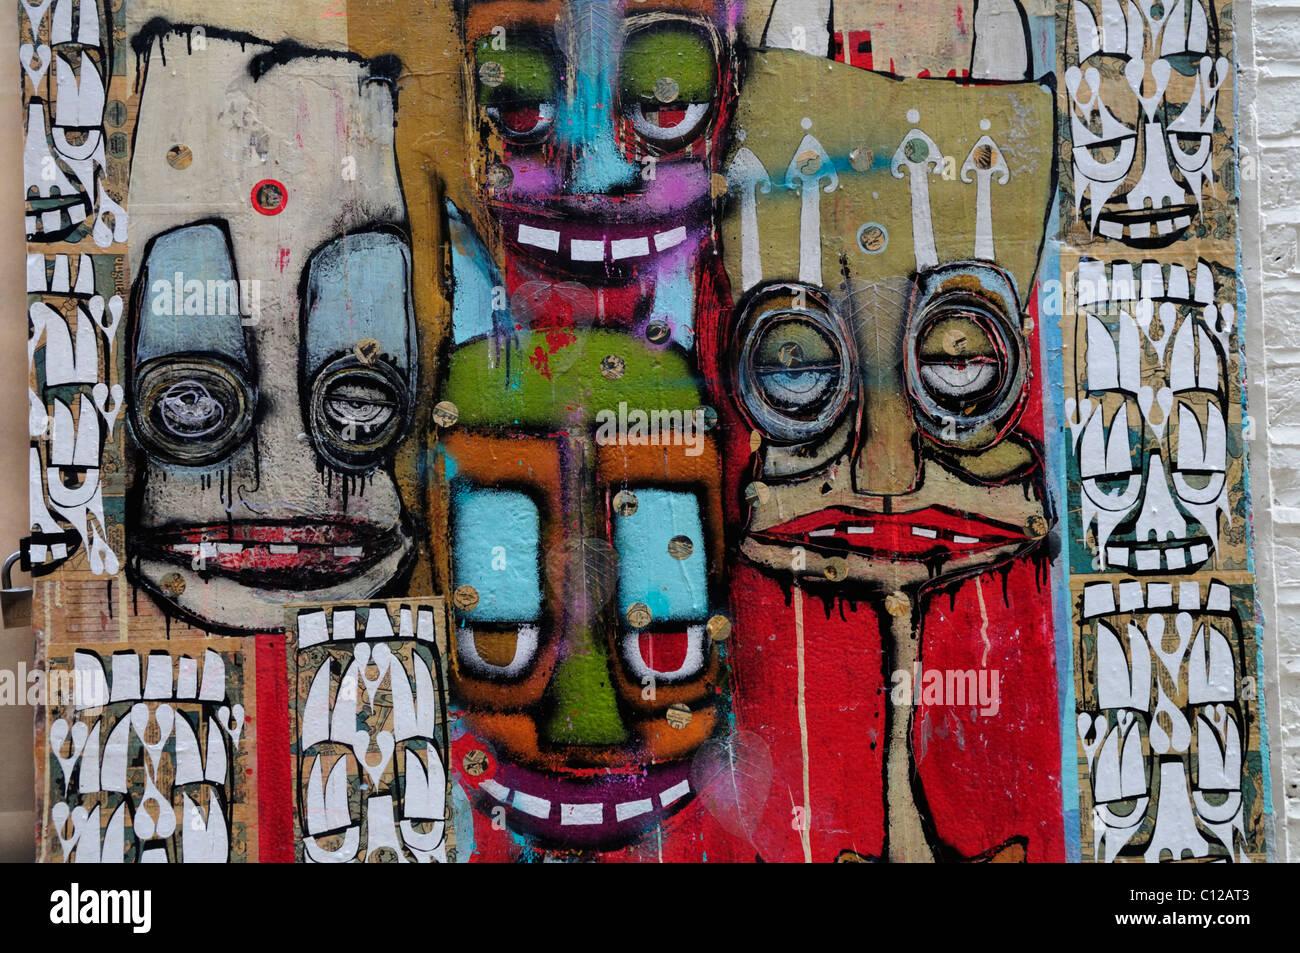 Graffiti on A Skateboarding Shop, Neal\'s Yard, Covent Garden Stock ...